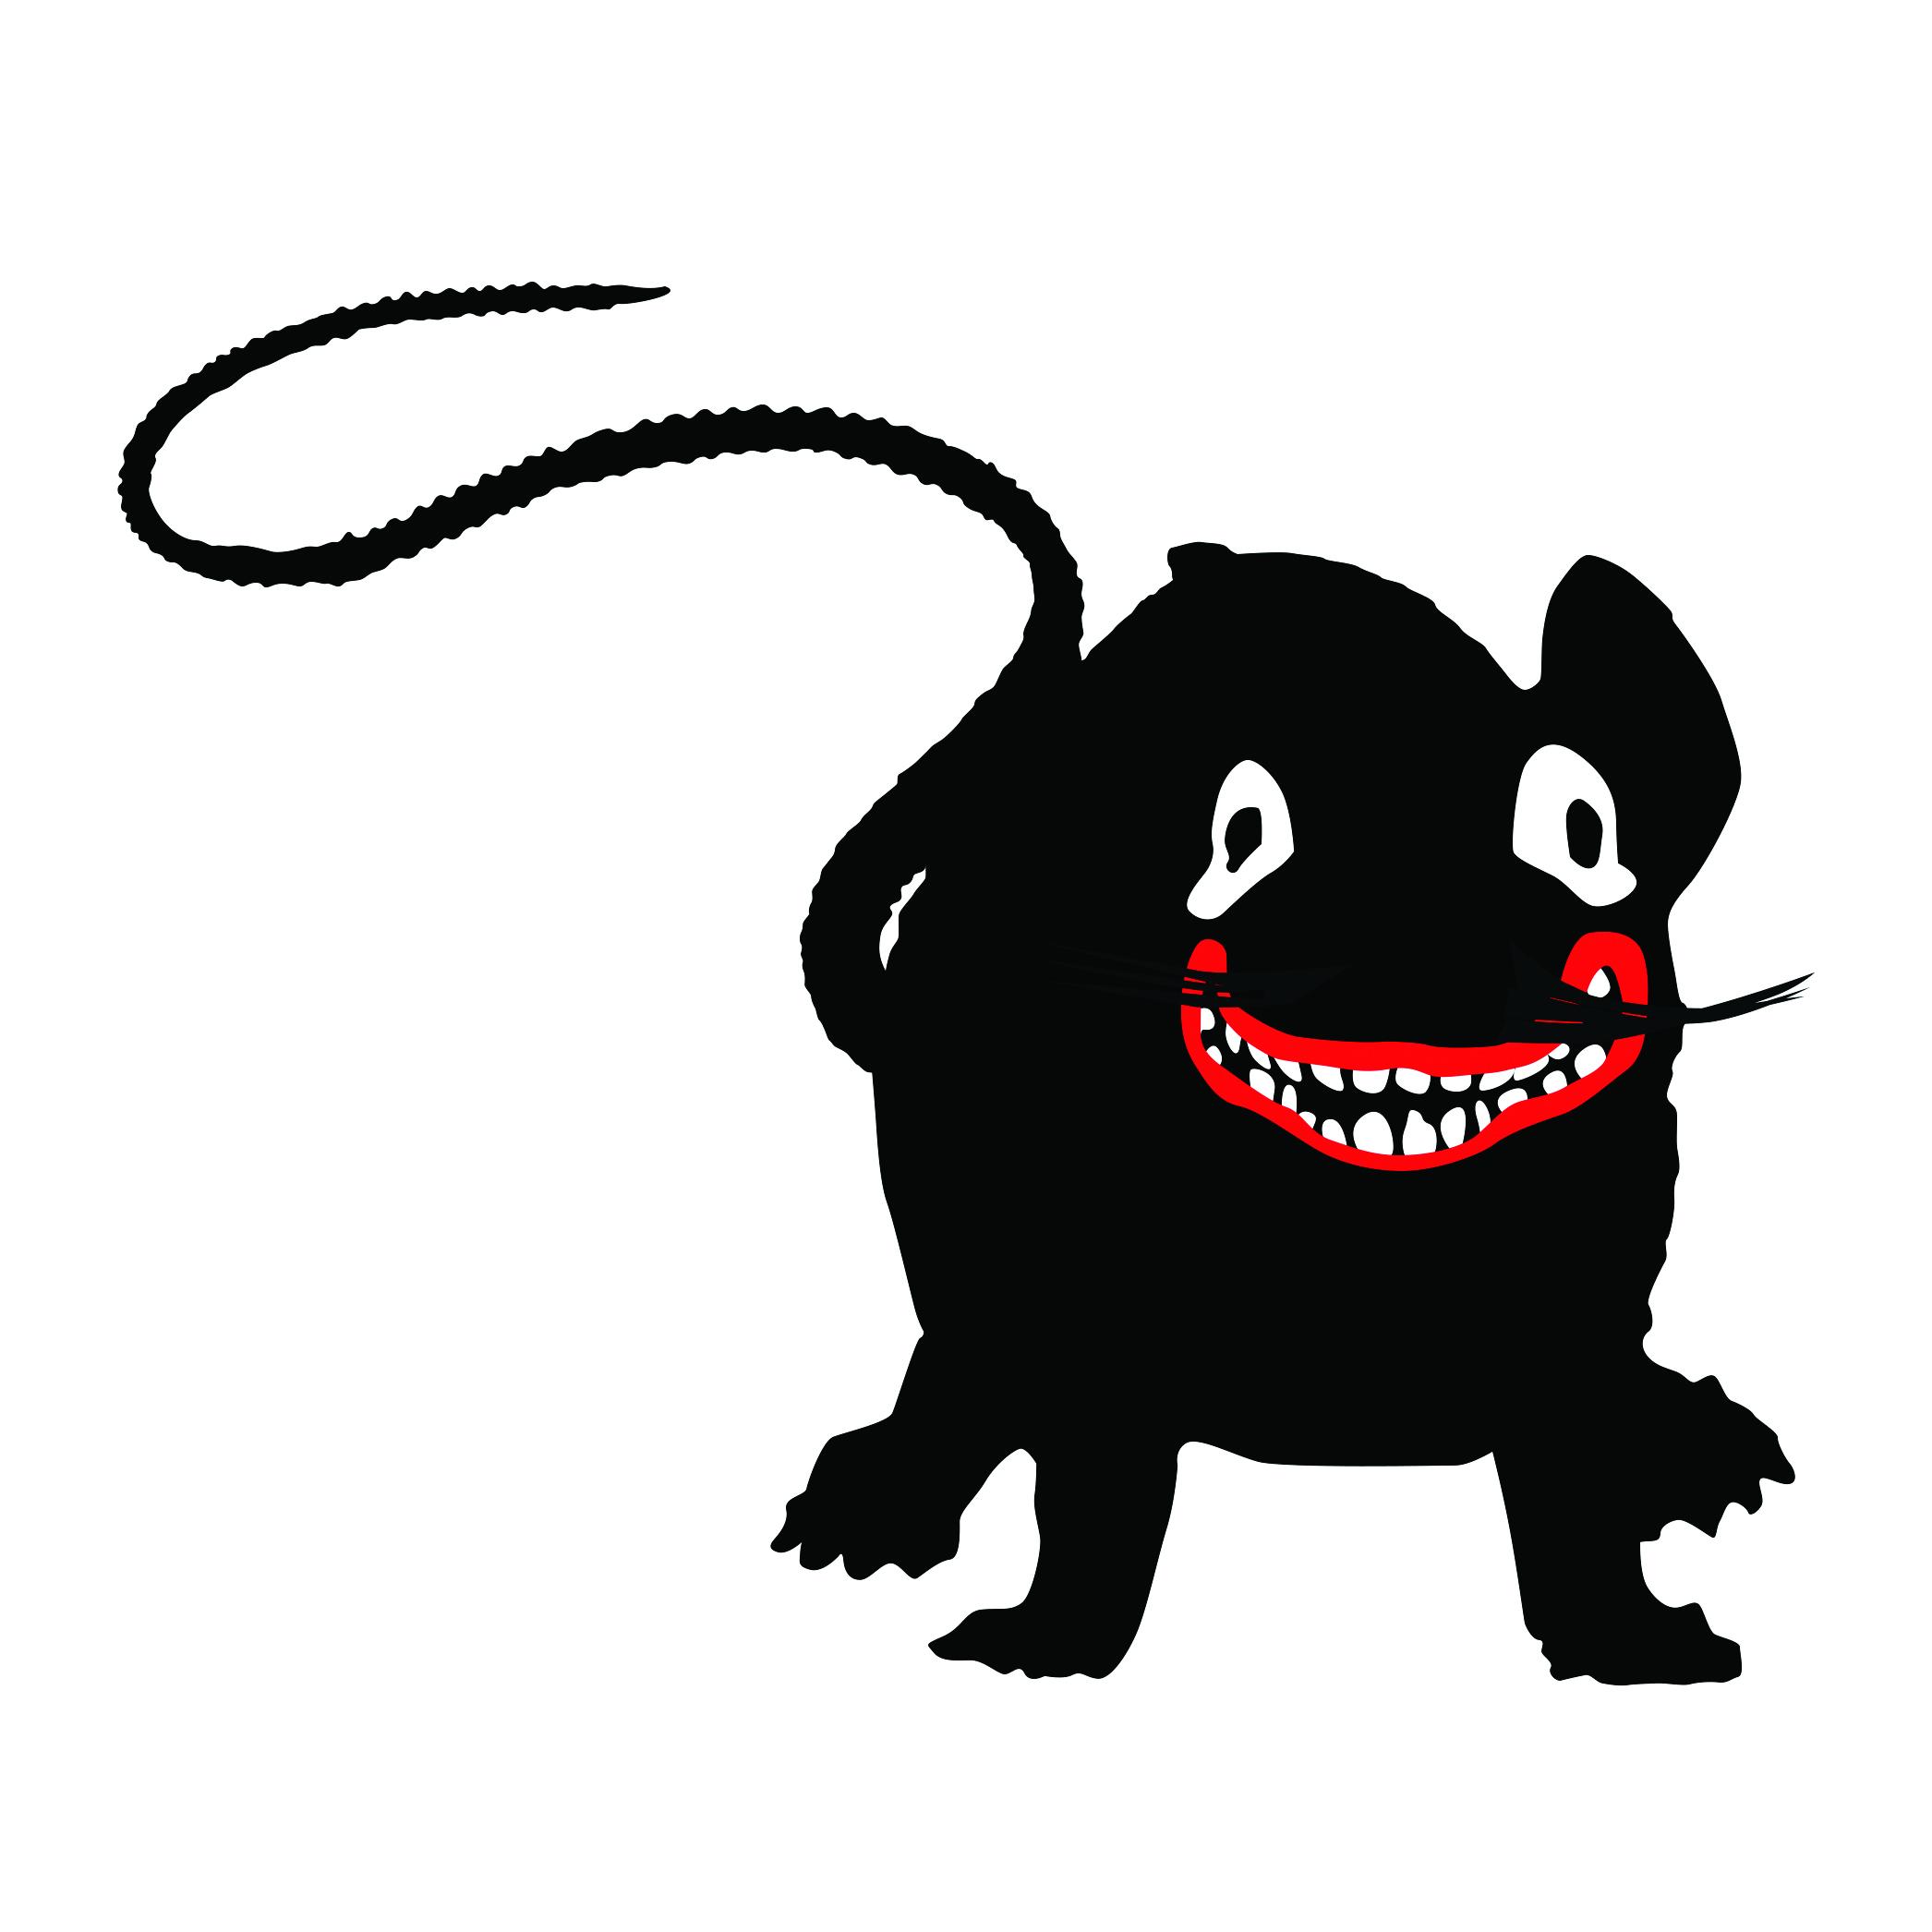 Afromantics The Rat